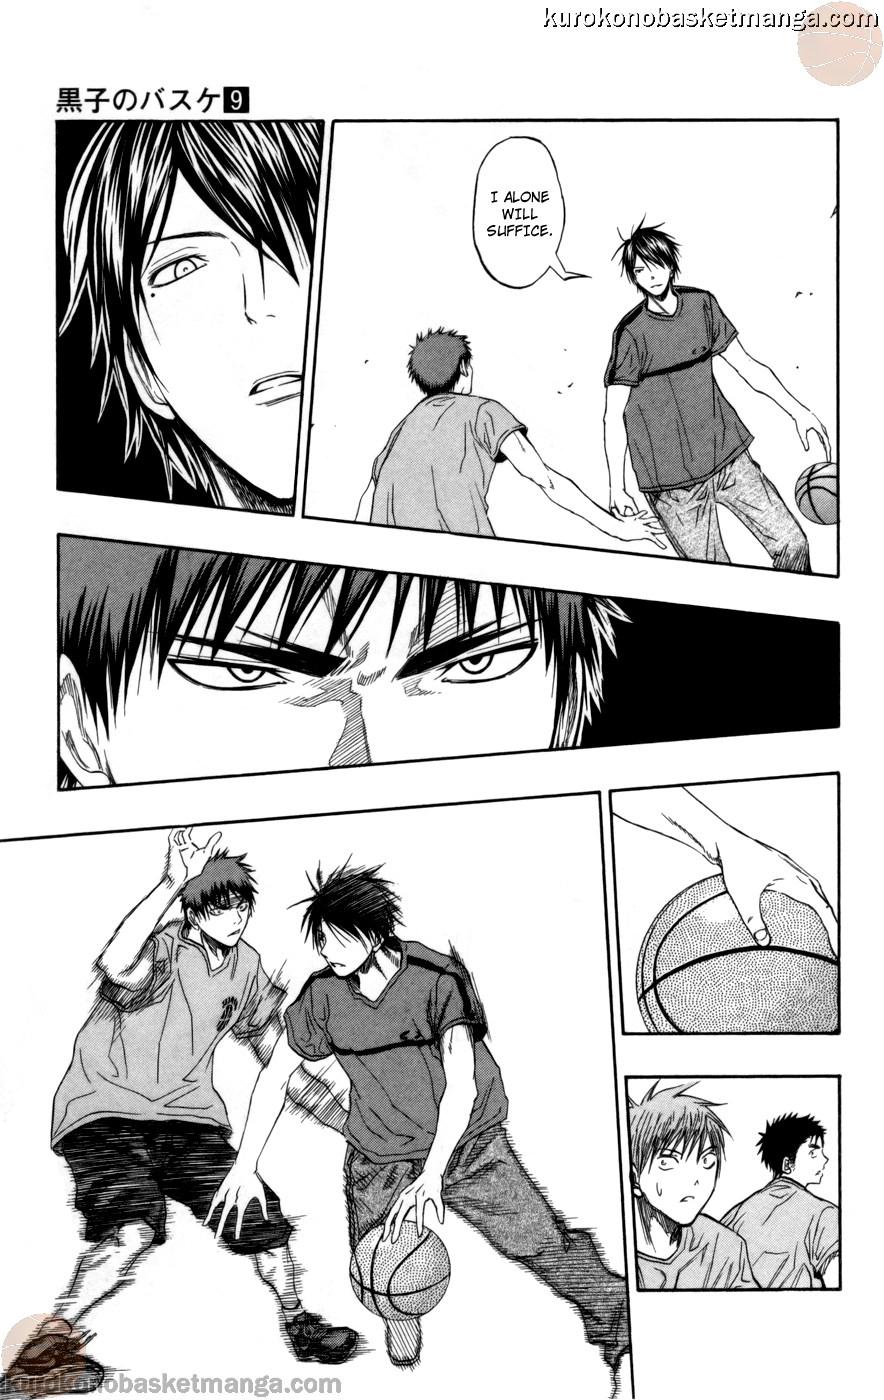 Kuroko no Basket Manga Chapter 79 - Image 05